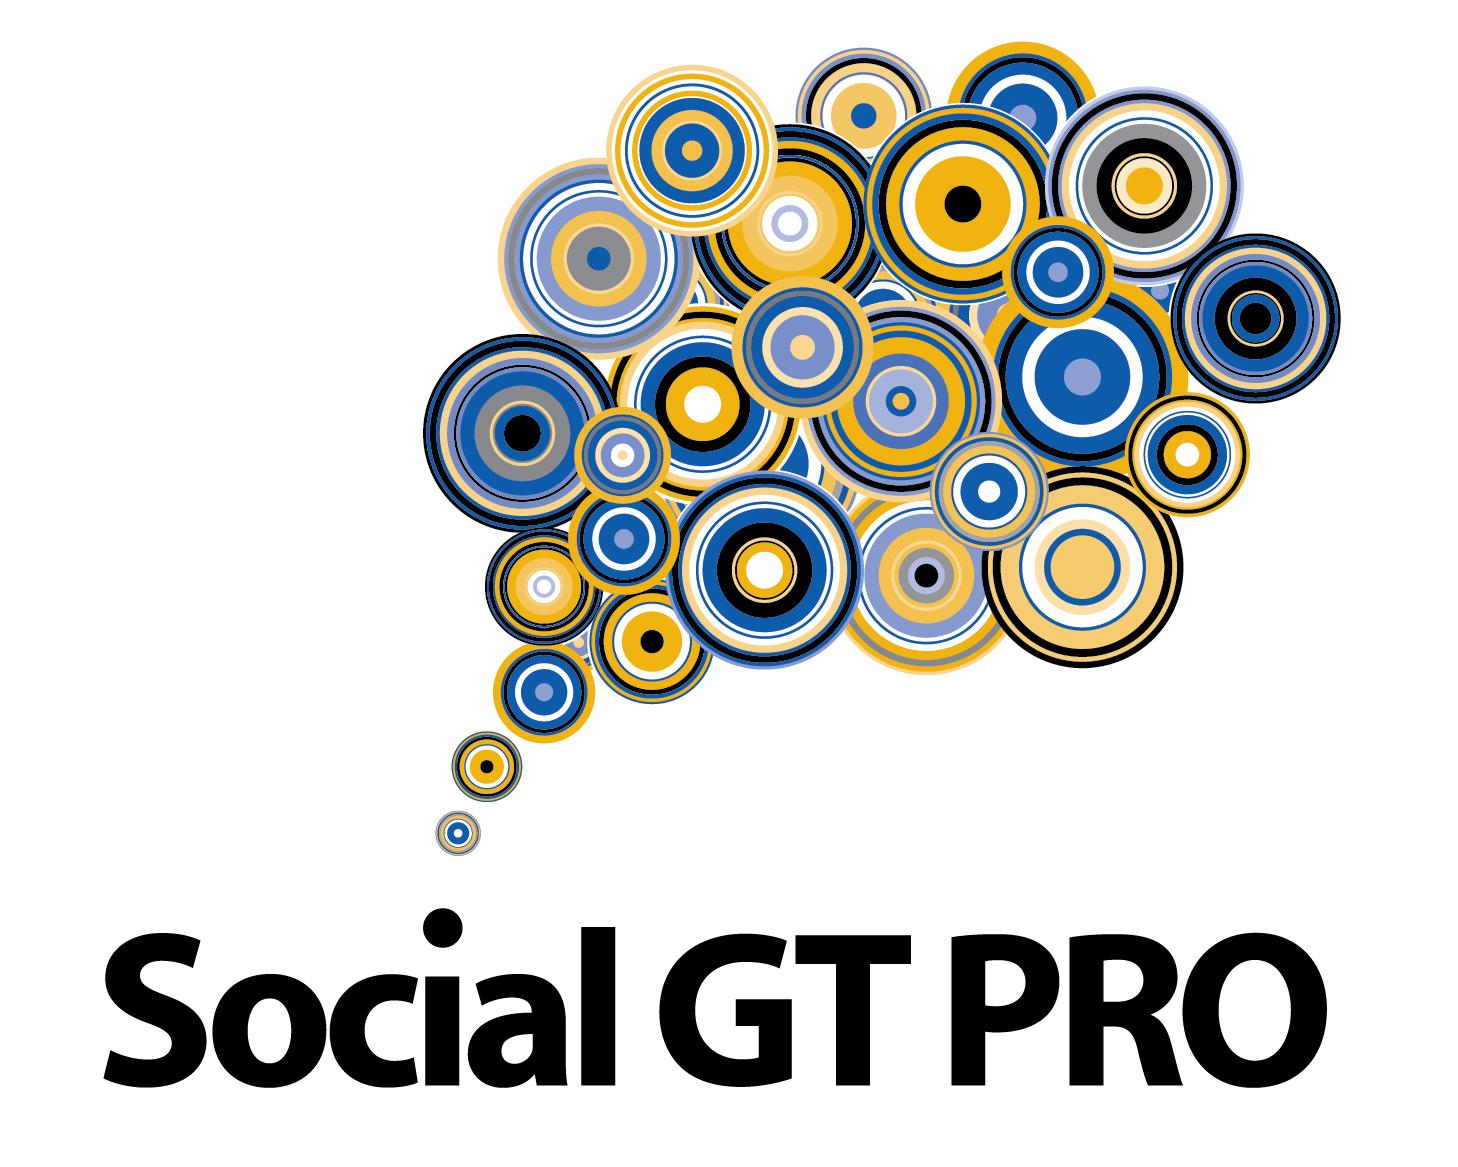 socialGTpro-01.jpg